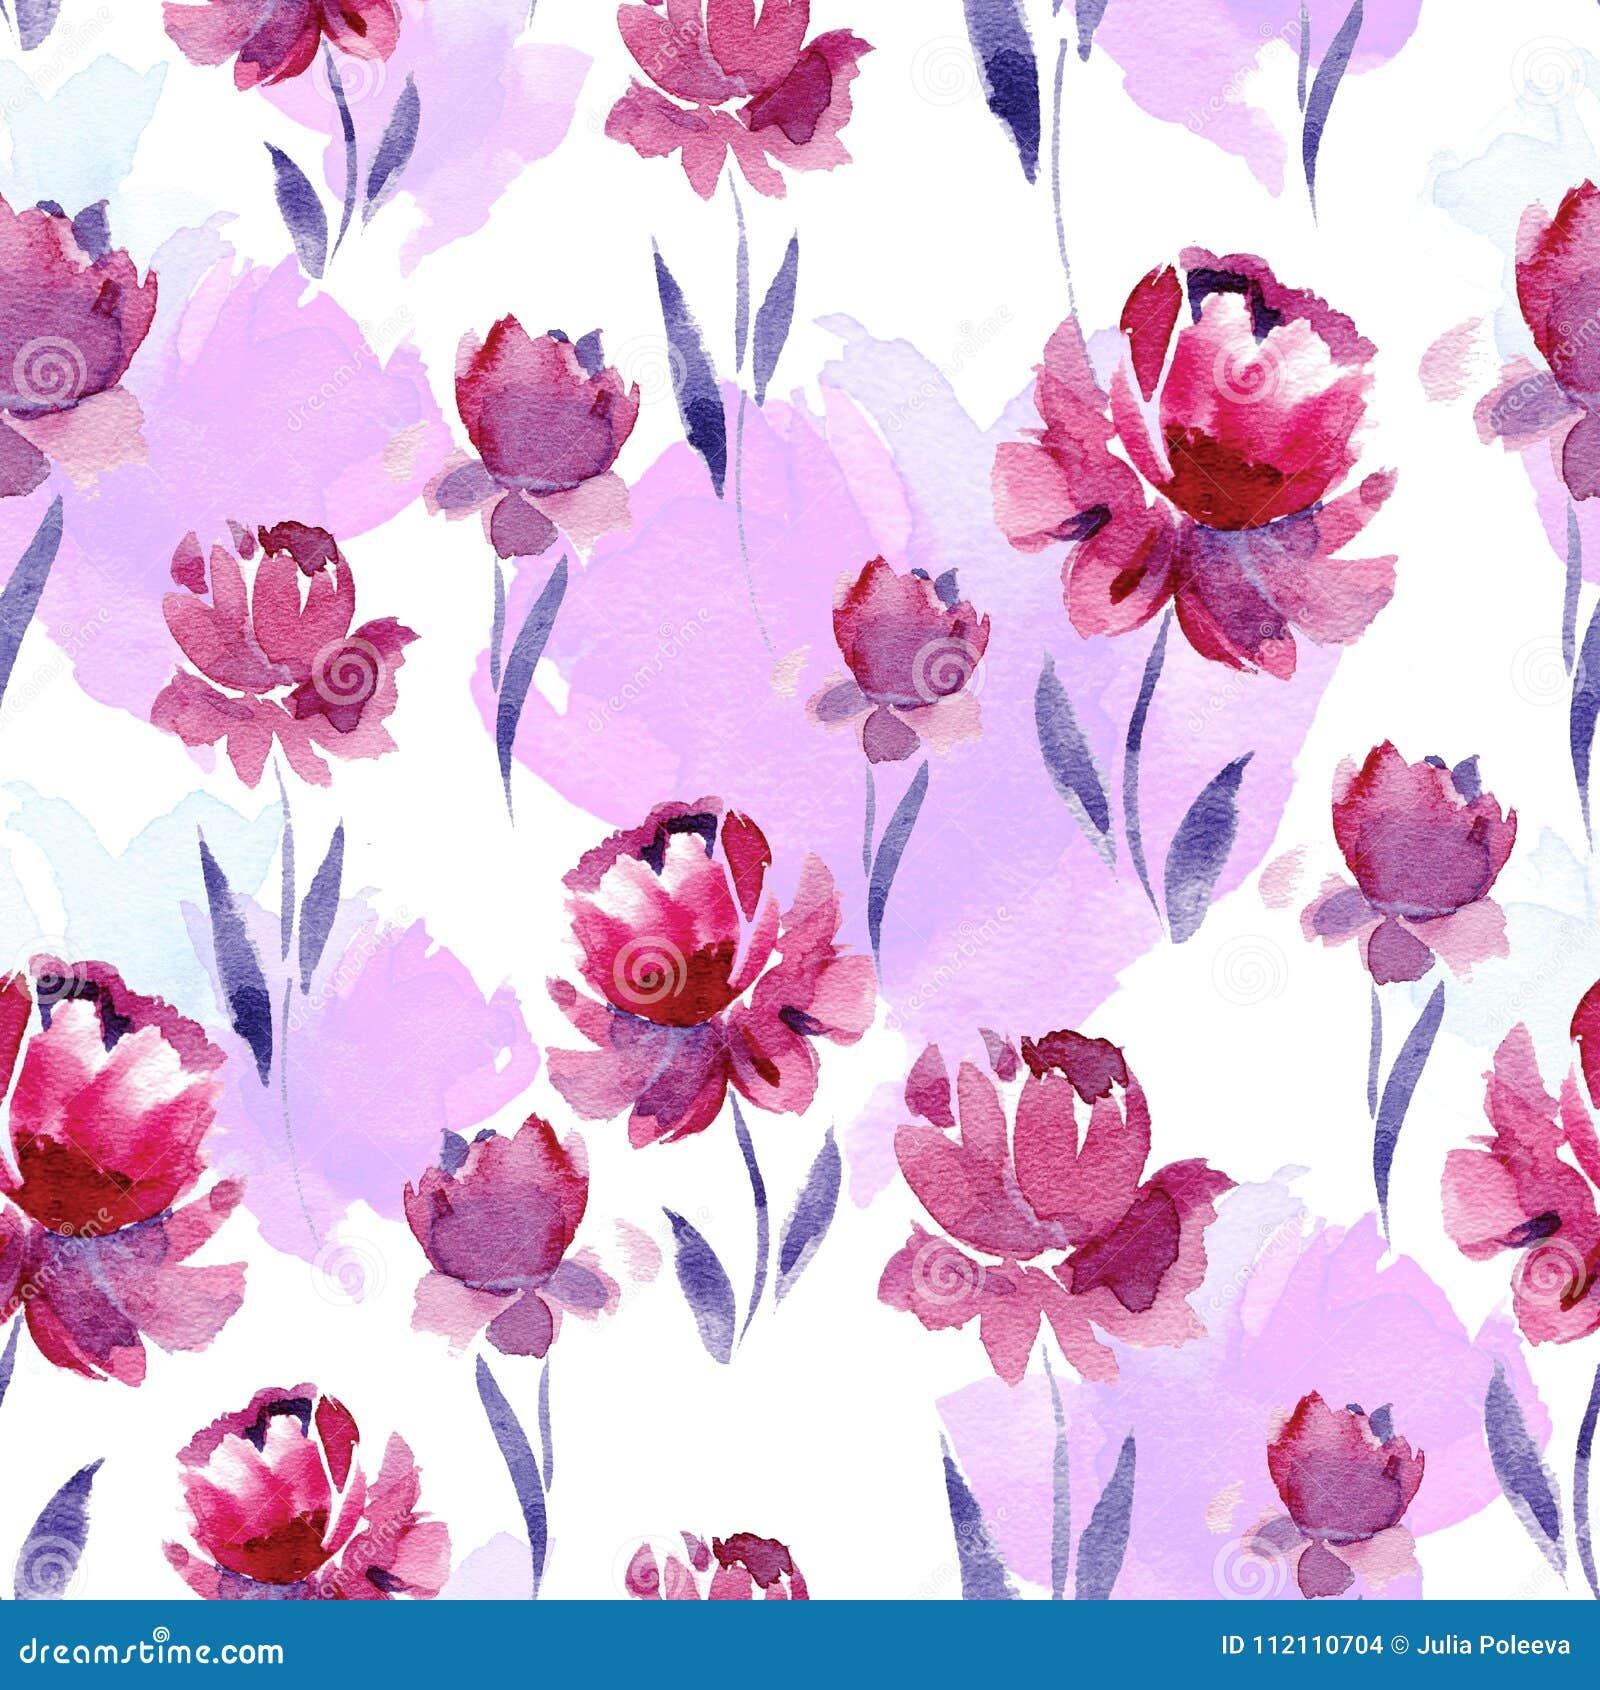 Seamless watercolor pattern of pink flowers and purple leaves on a seamless watercolor pattern of pink flowers and purple leaves on a white background mightylinksfo